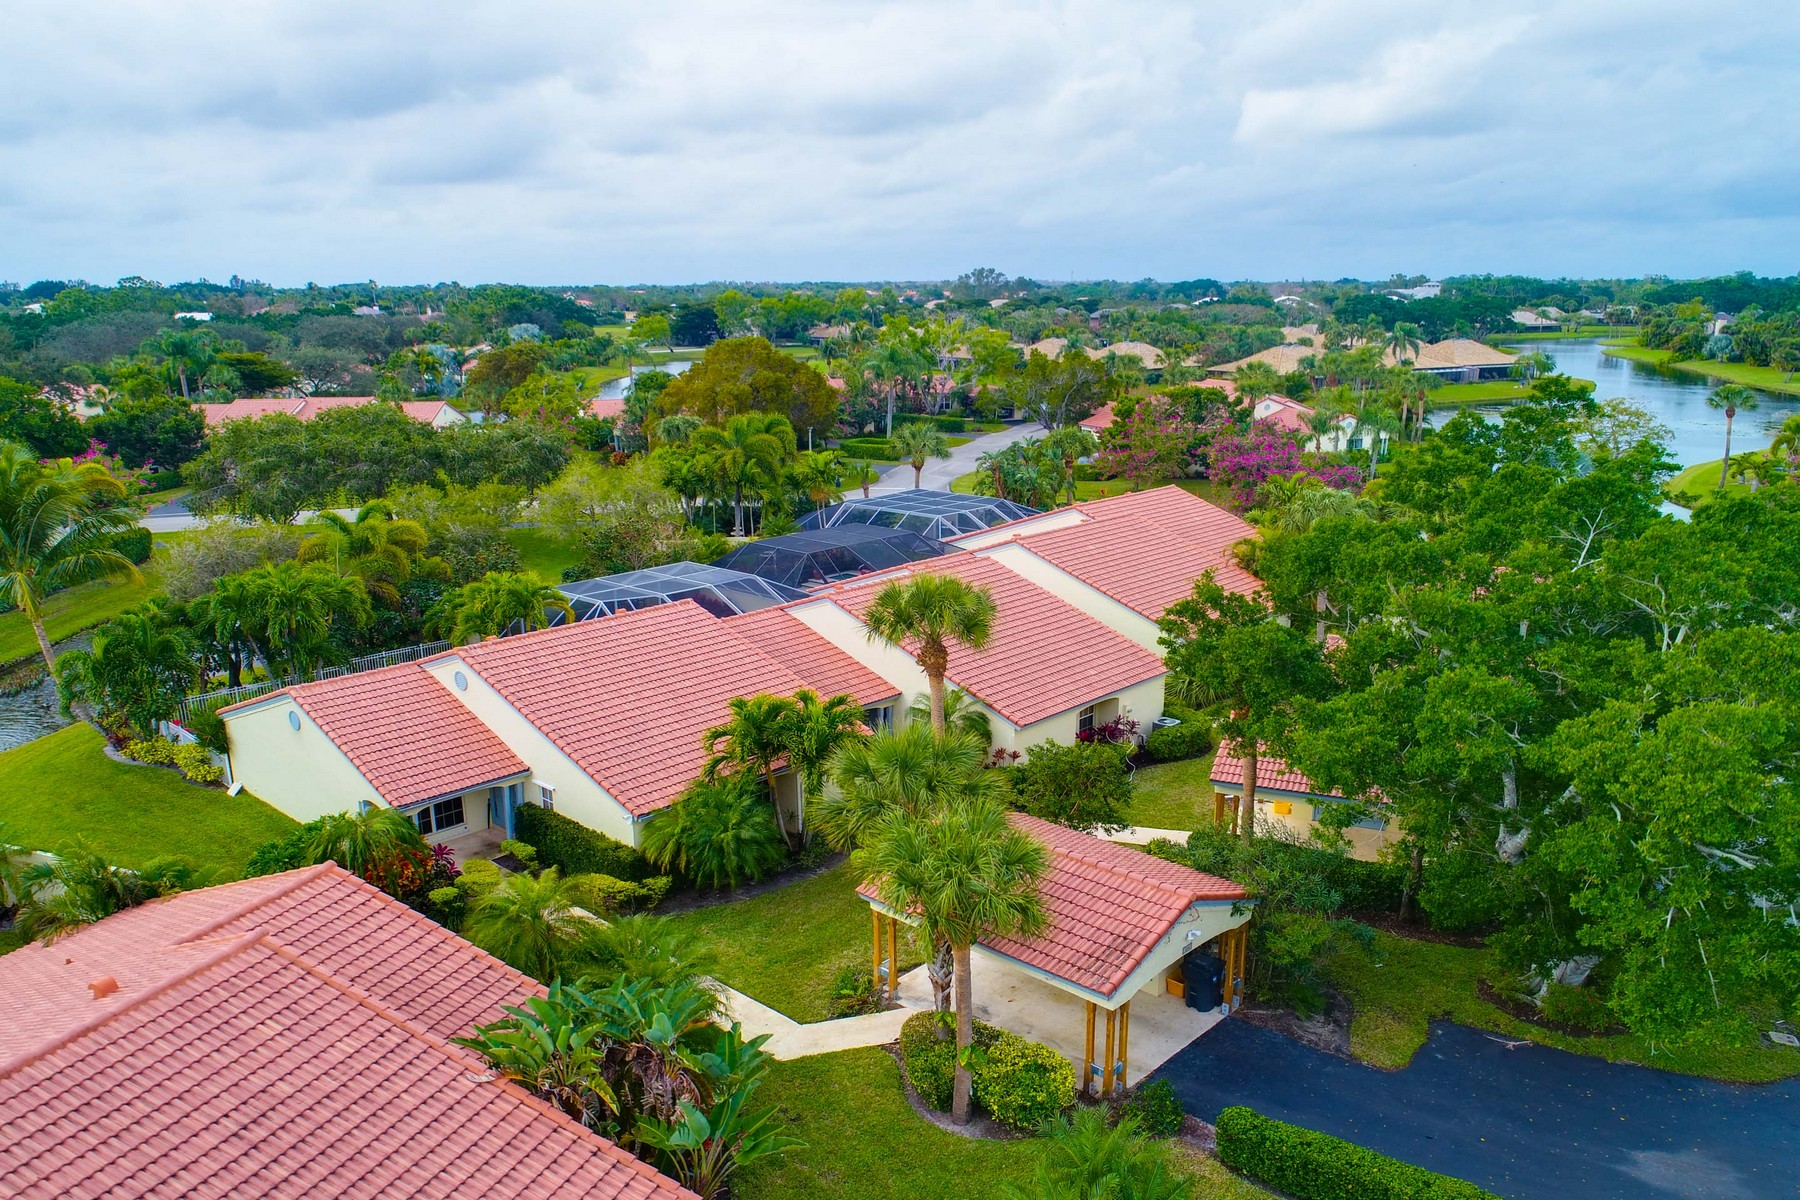 Single Family Home for Sale at 2244 Las Casitas 2244 Las Casitas Drive, Wellington, Florida, 33414 United States